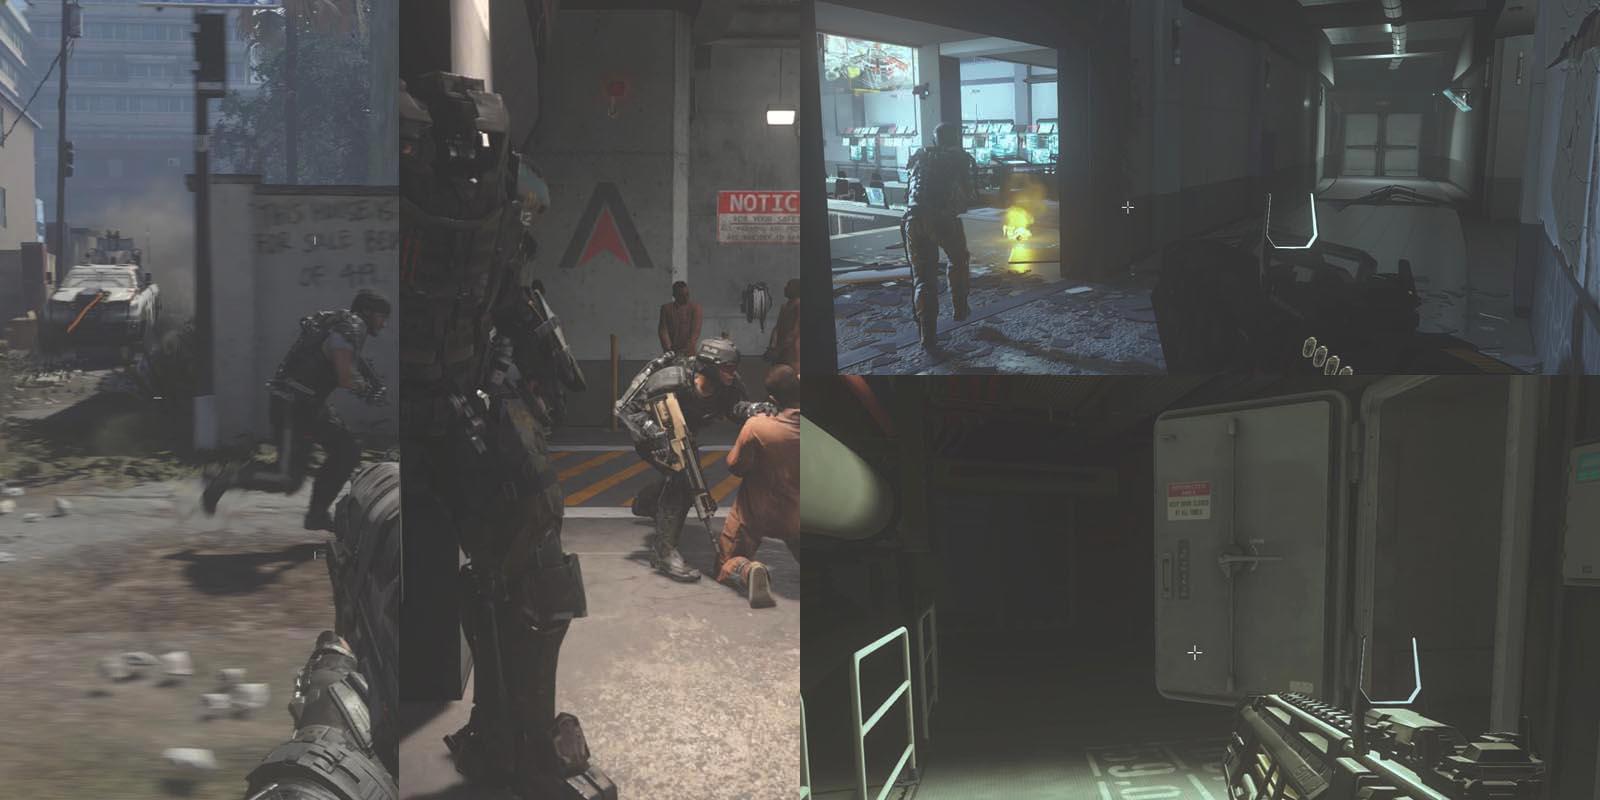 cod_aw_nav_negative_space